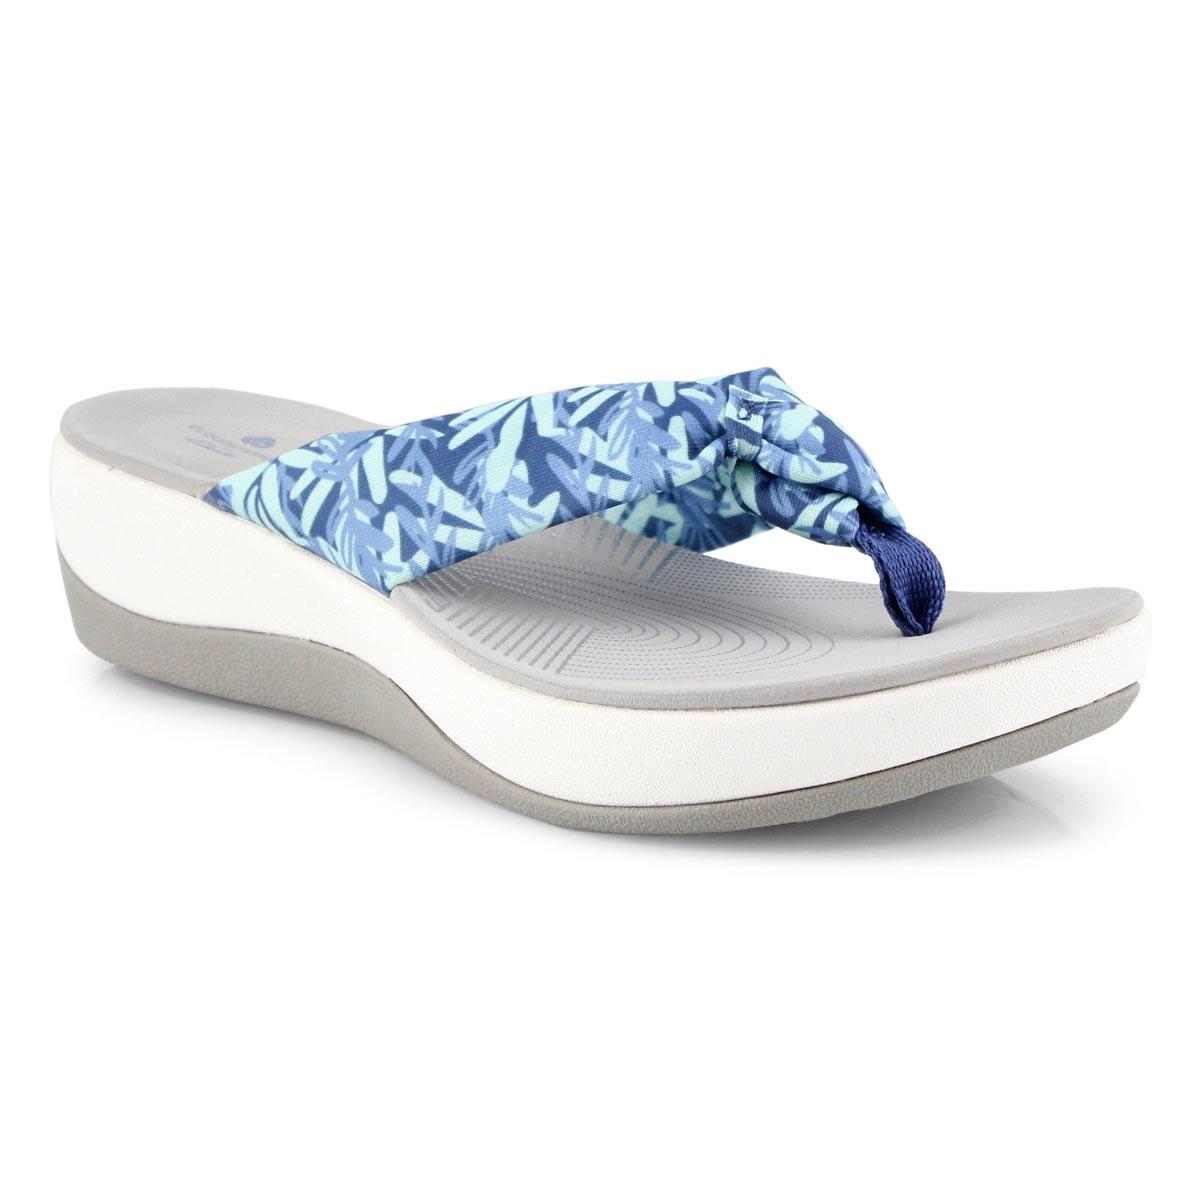 Women's Arla Glison Thong Wedge Sandal - Flor Blu